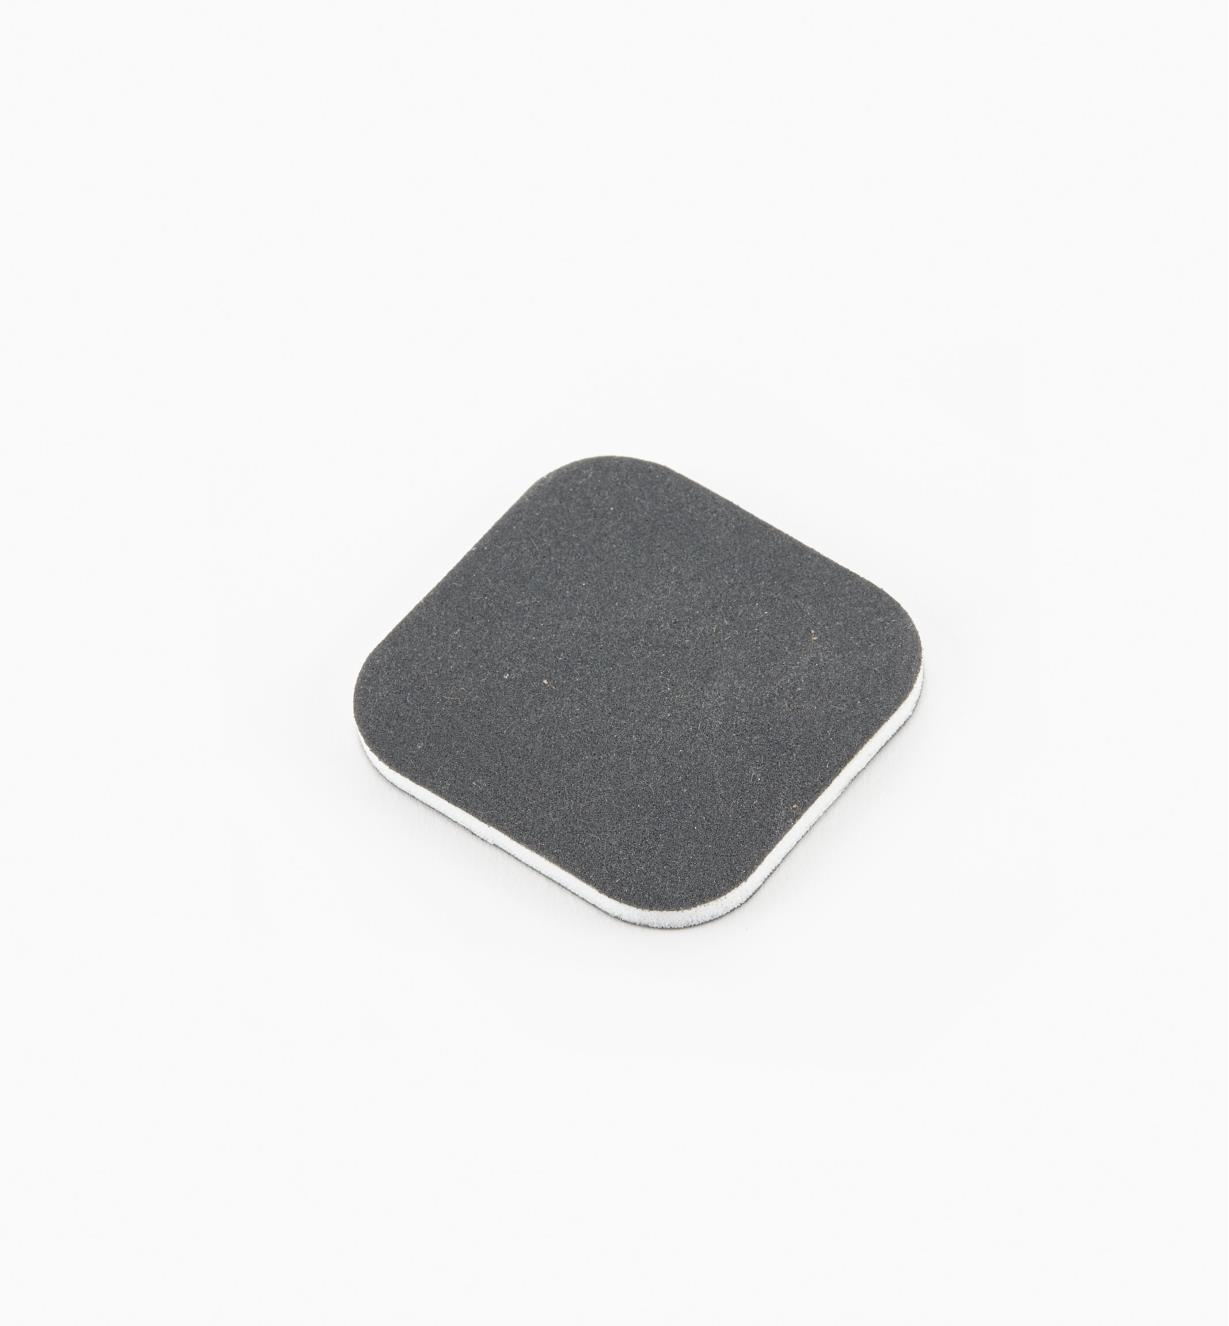 54K9012 - 2400x Micro-Mesh Pen-Sanding Pad, each